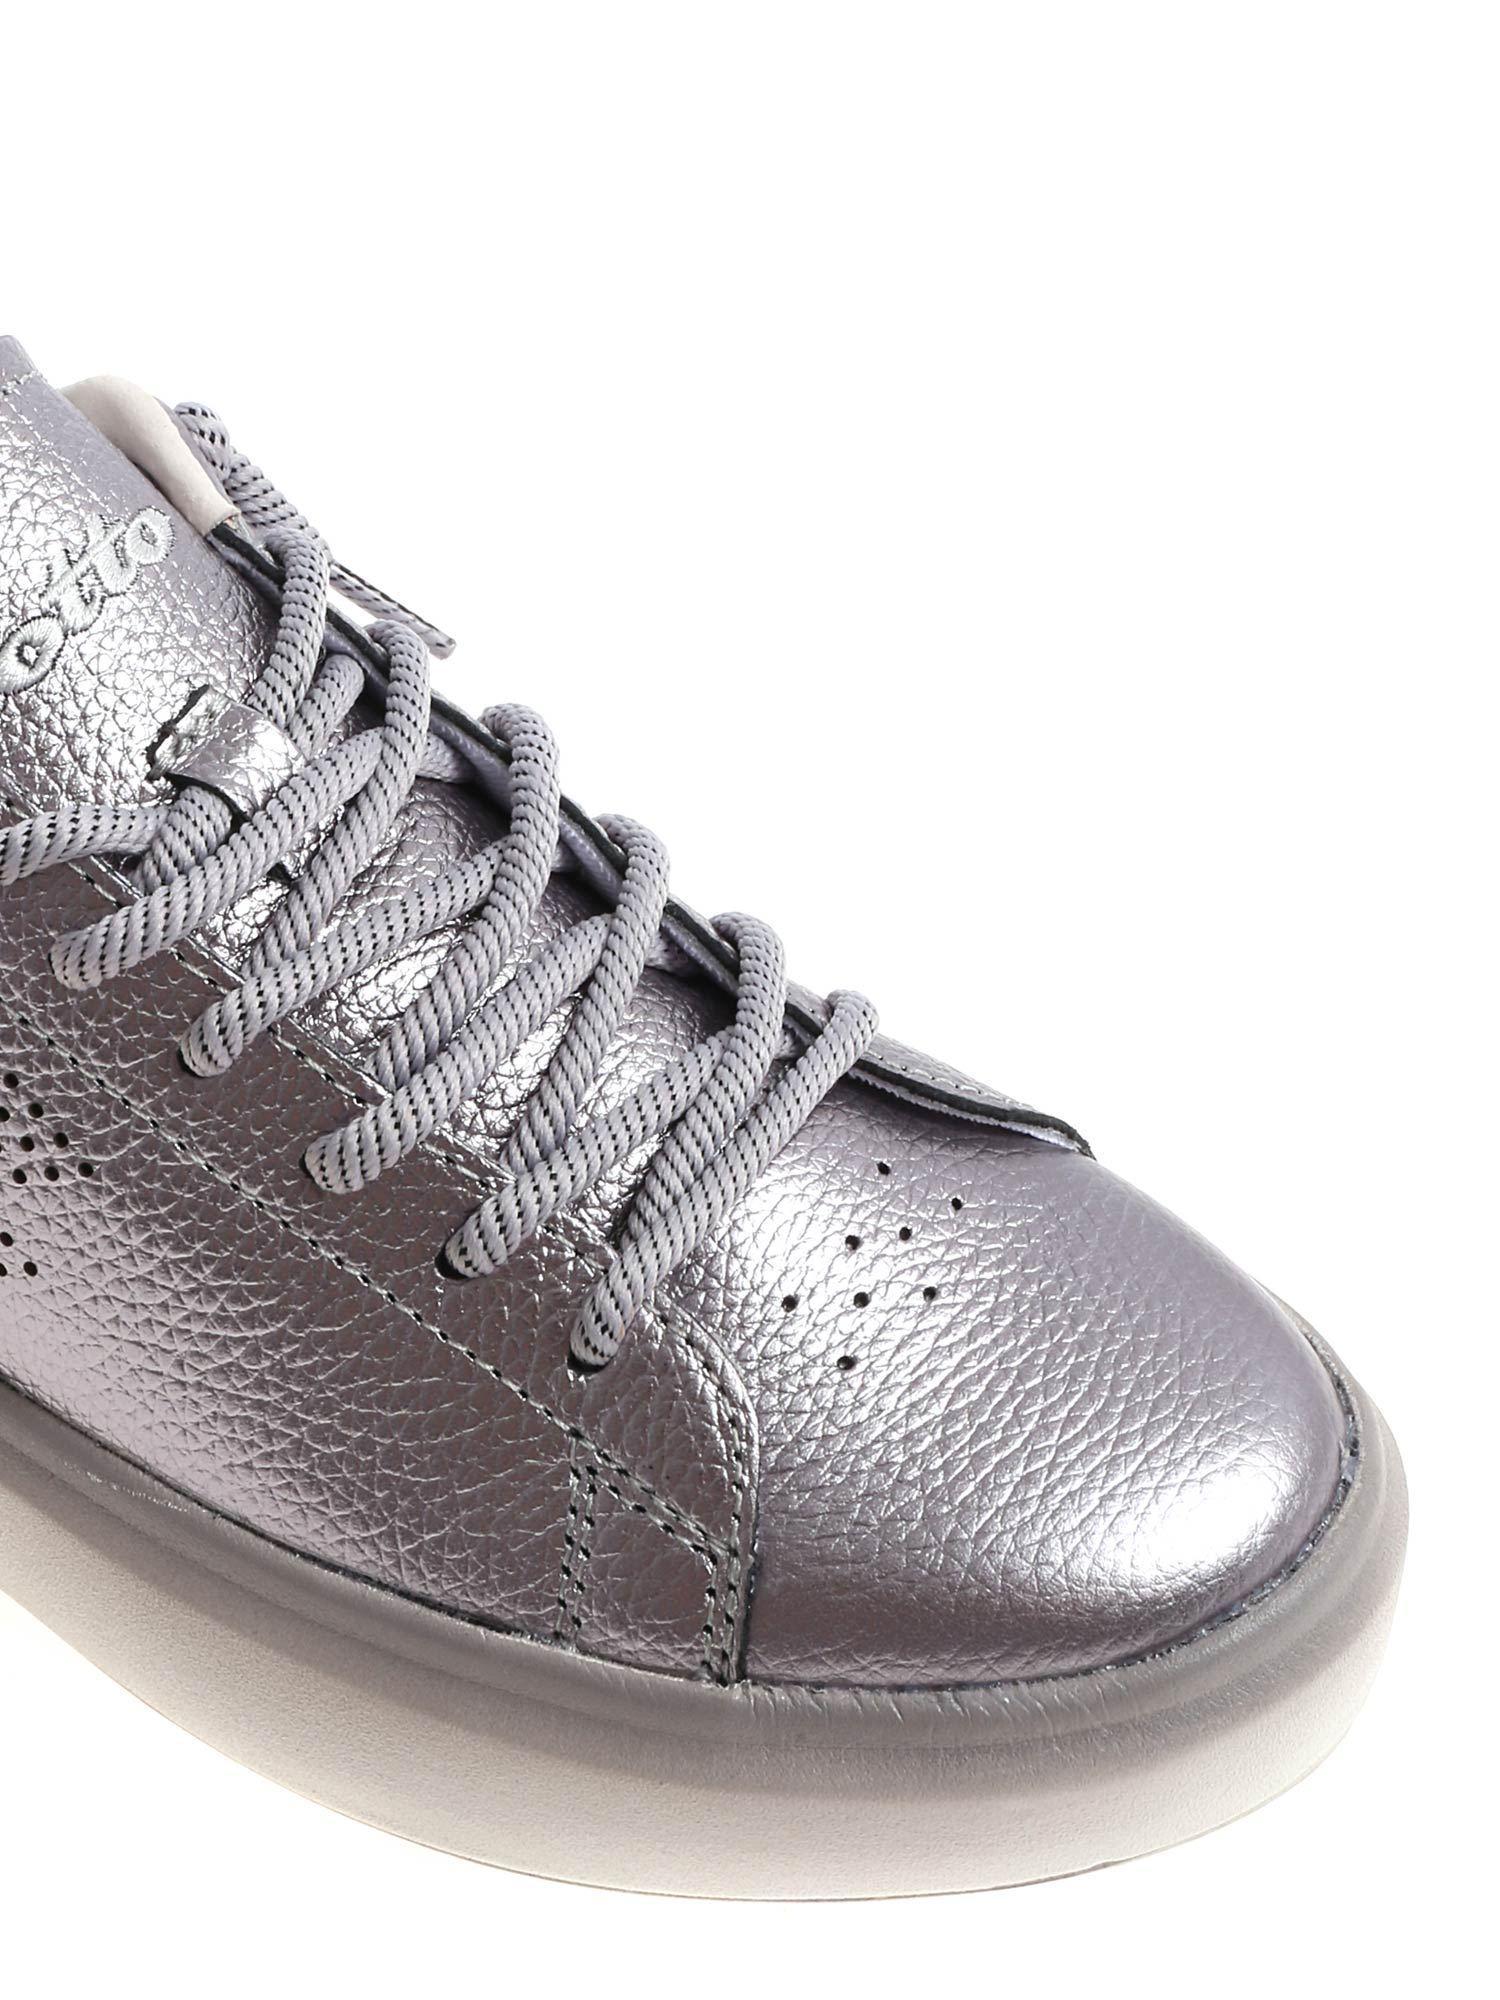 Lotto Leggenda Leather Silver Impressions Metal Sneakers in Metallic